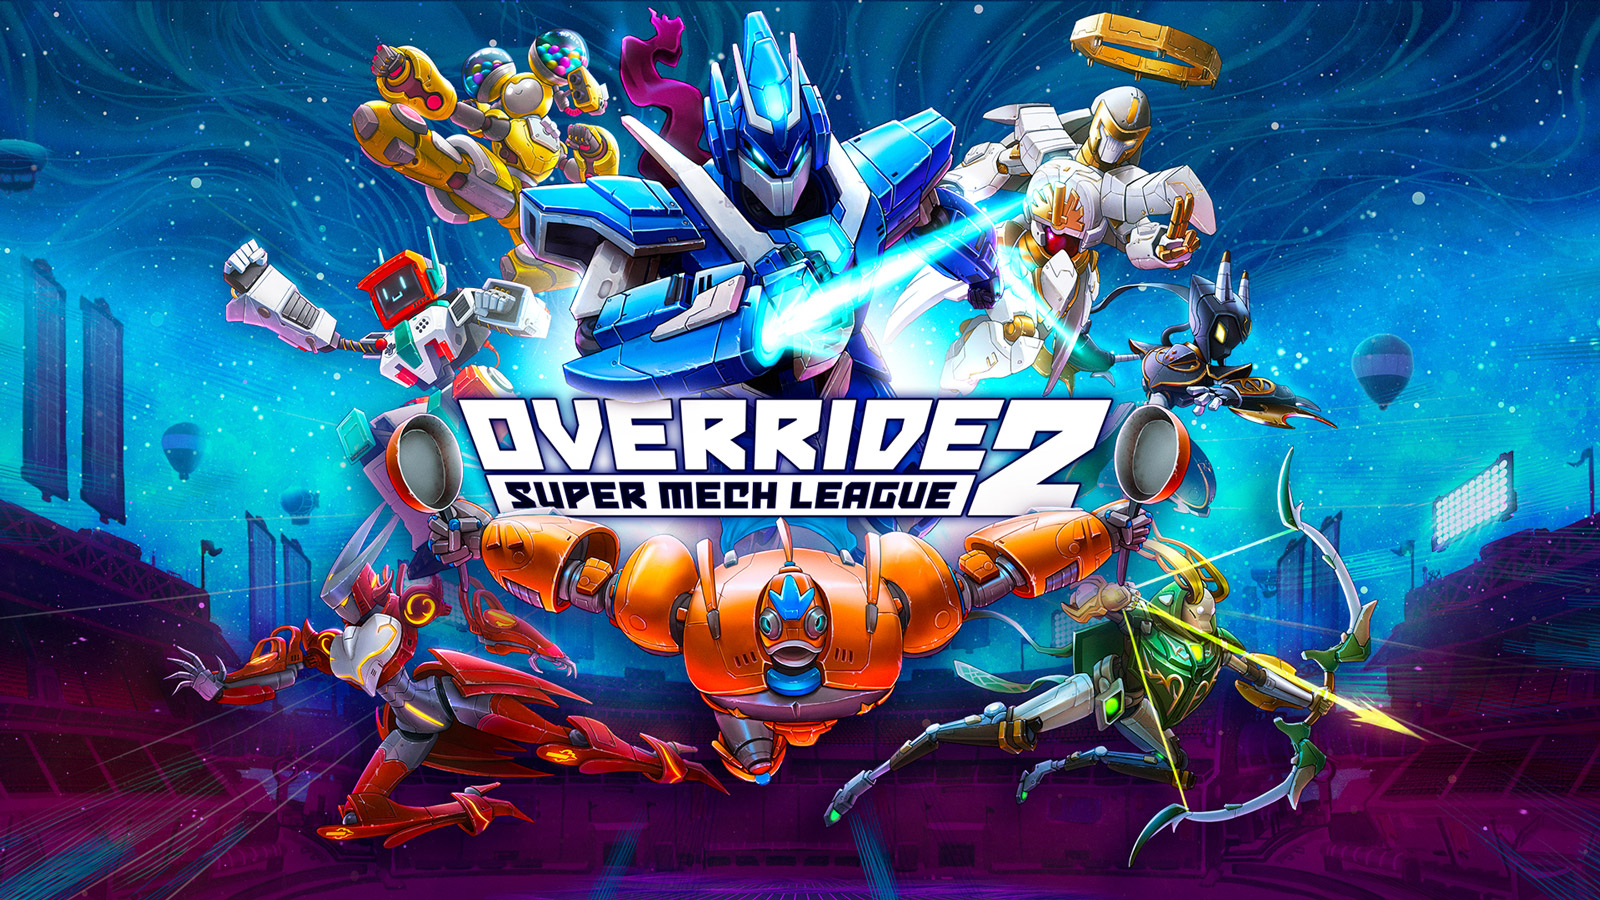 Override 2: Super Mech League Wallpaper in 1600x900